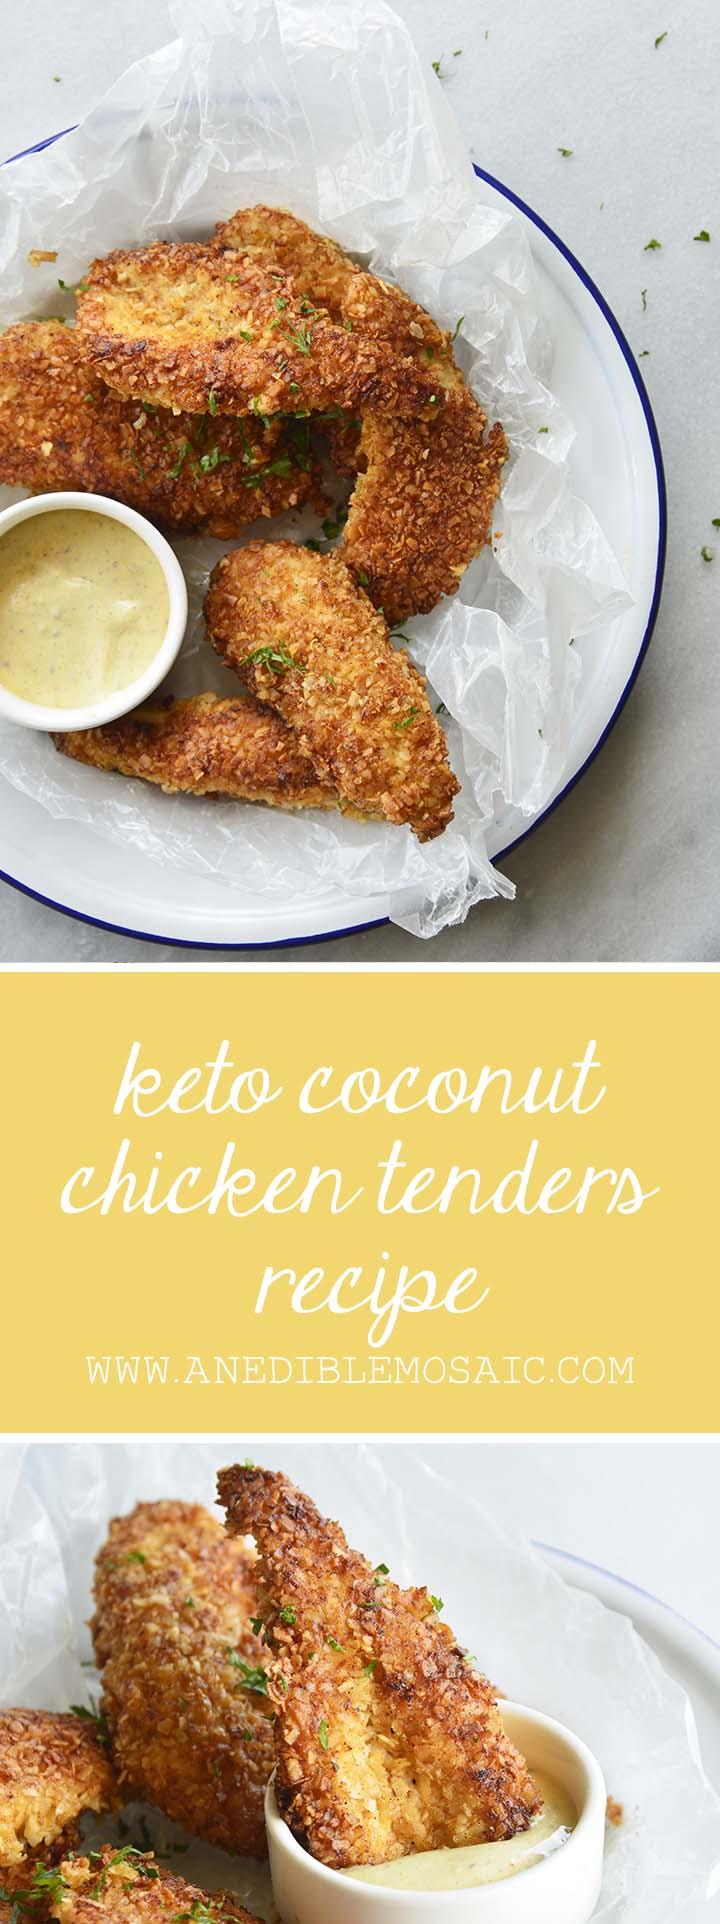 Keto Coconut Chicken Tenders Recipe Pin